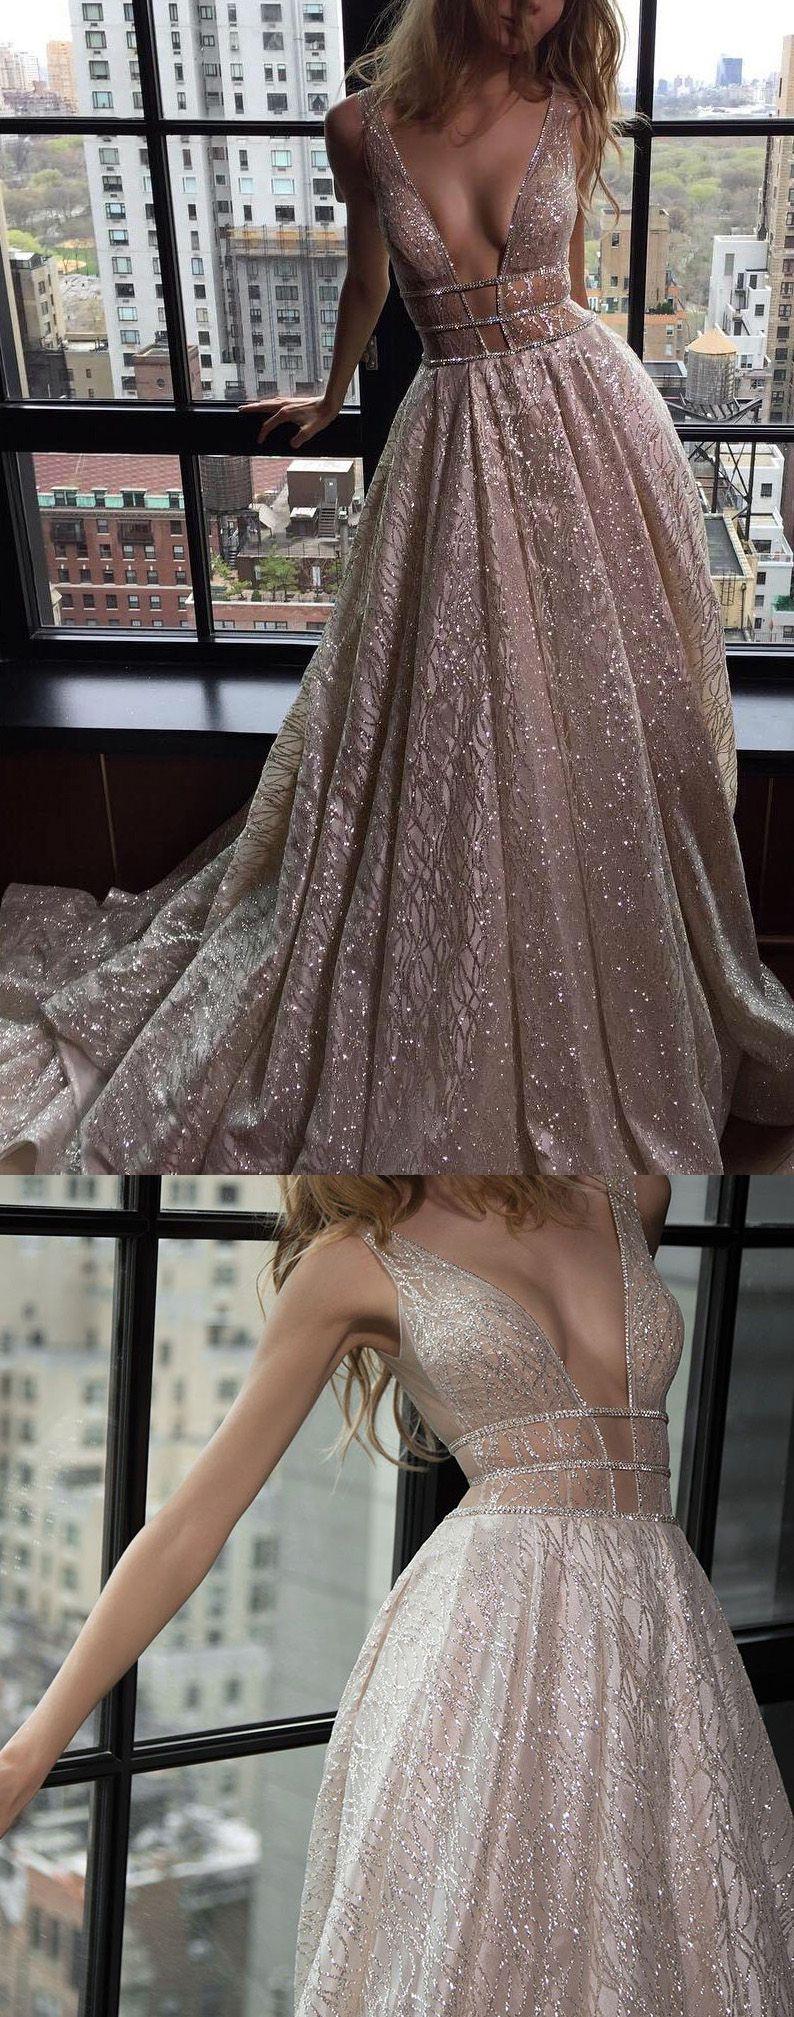 Sleeveless prom dresses silver sleeveless evening dresses long